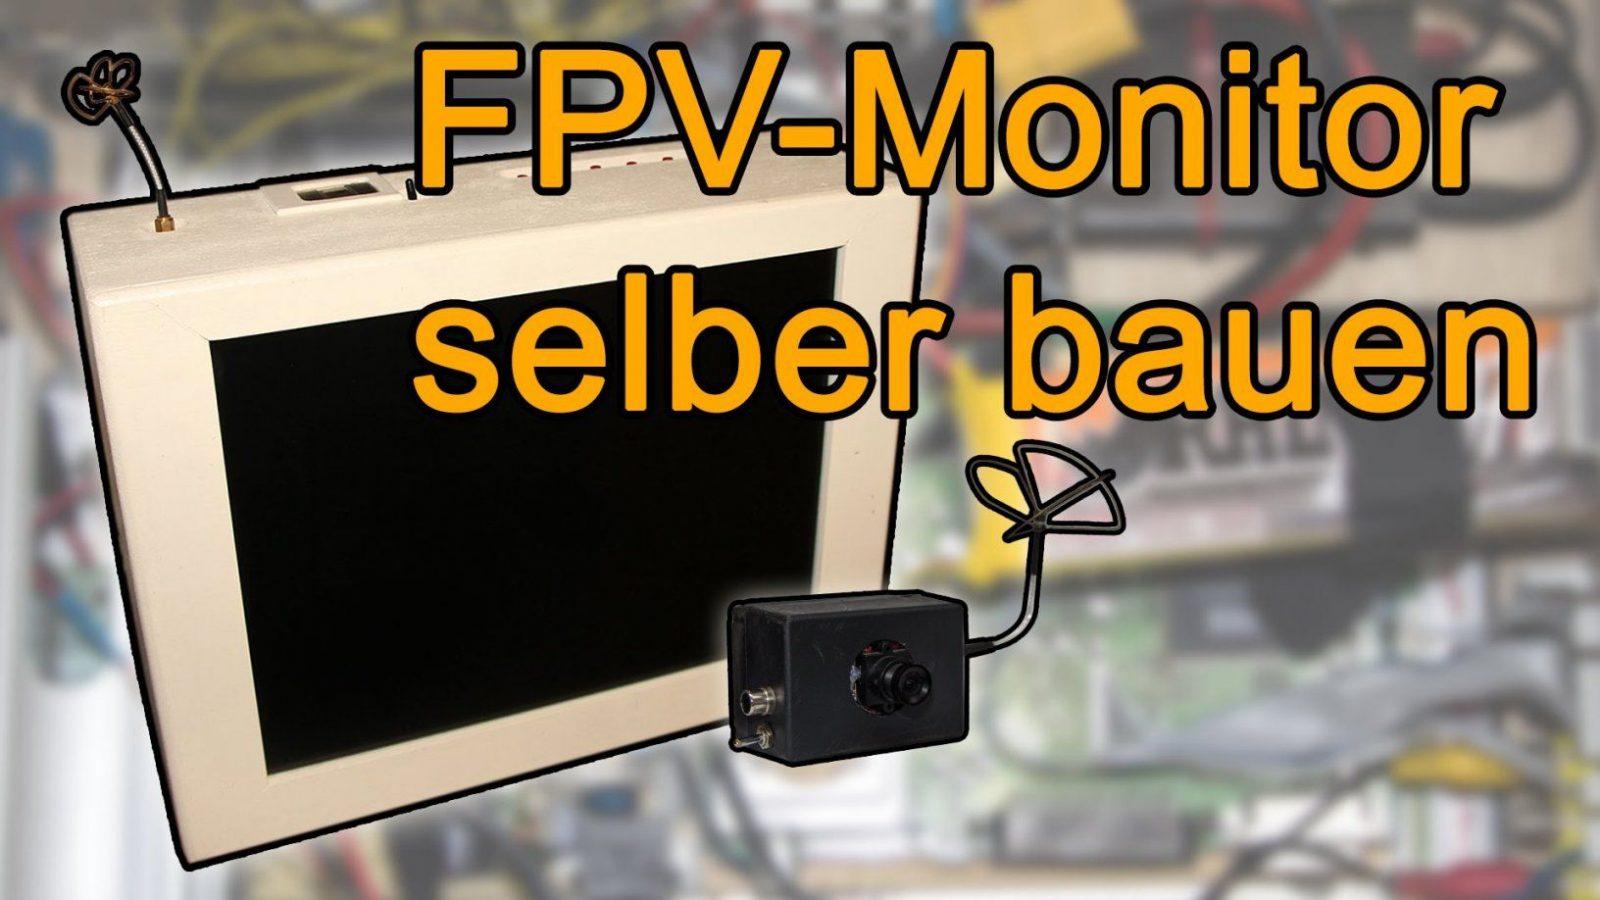 Fpv Monitor Selber Bauen  Tragbar  Tutorial  Youtube von Fpv Brille Selber Bauen Bild